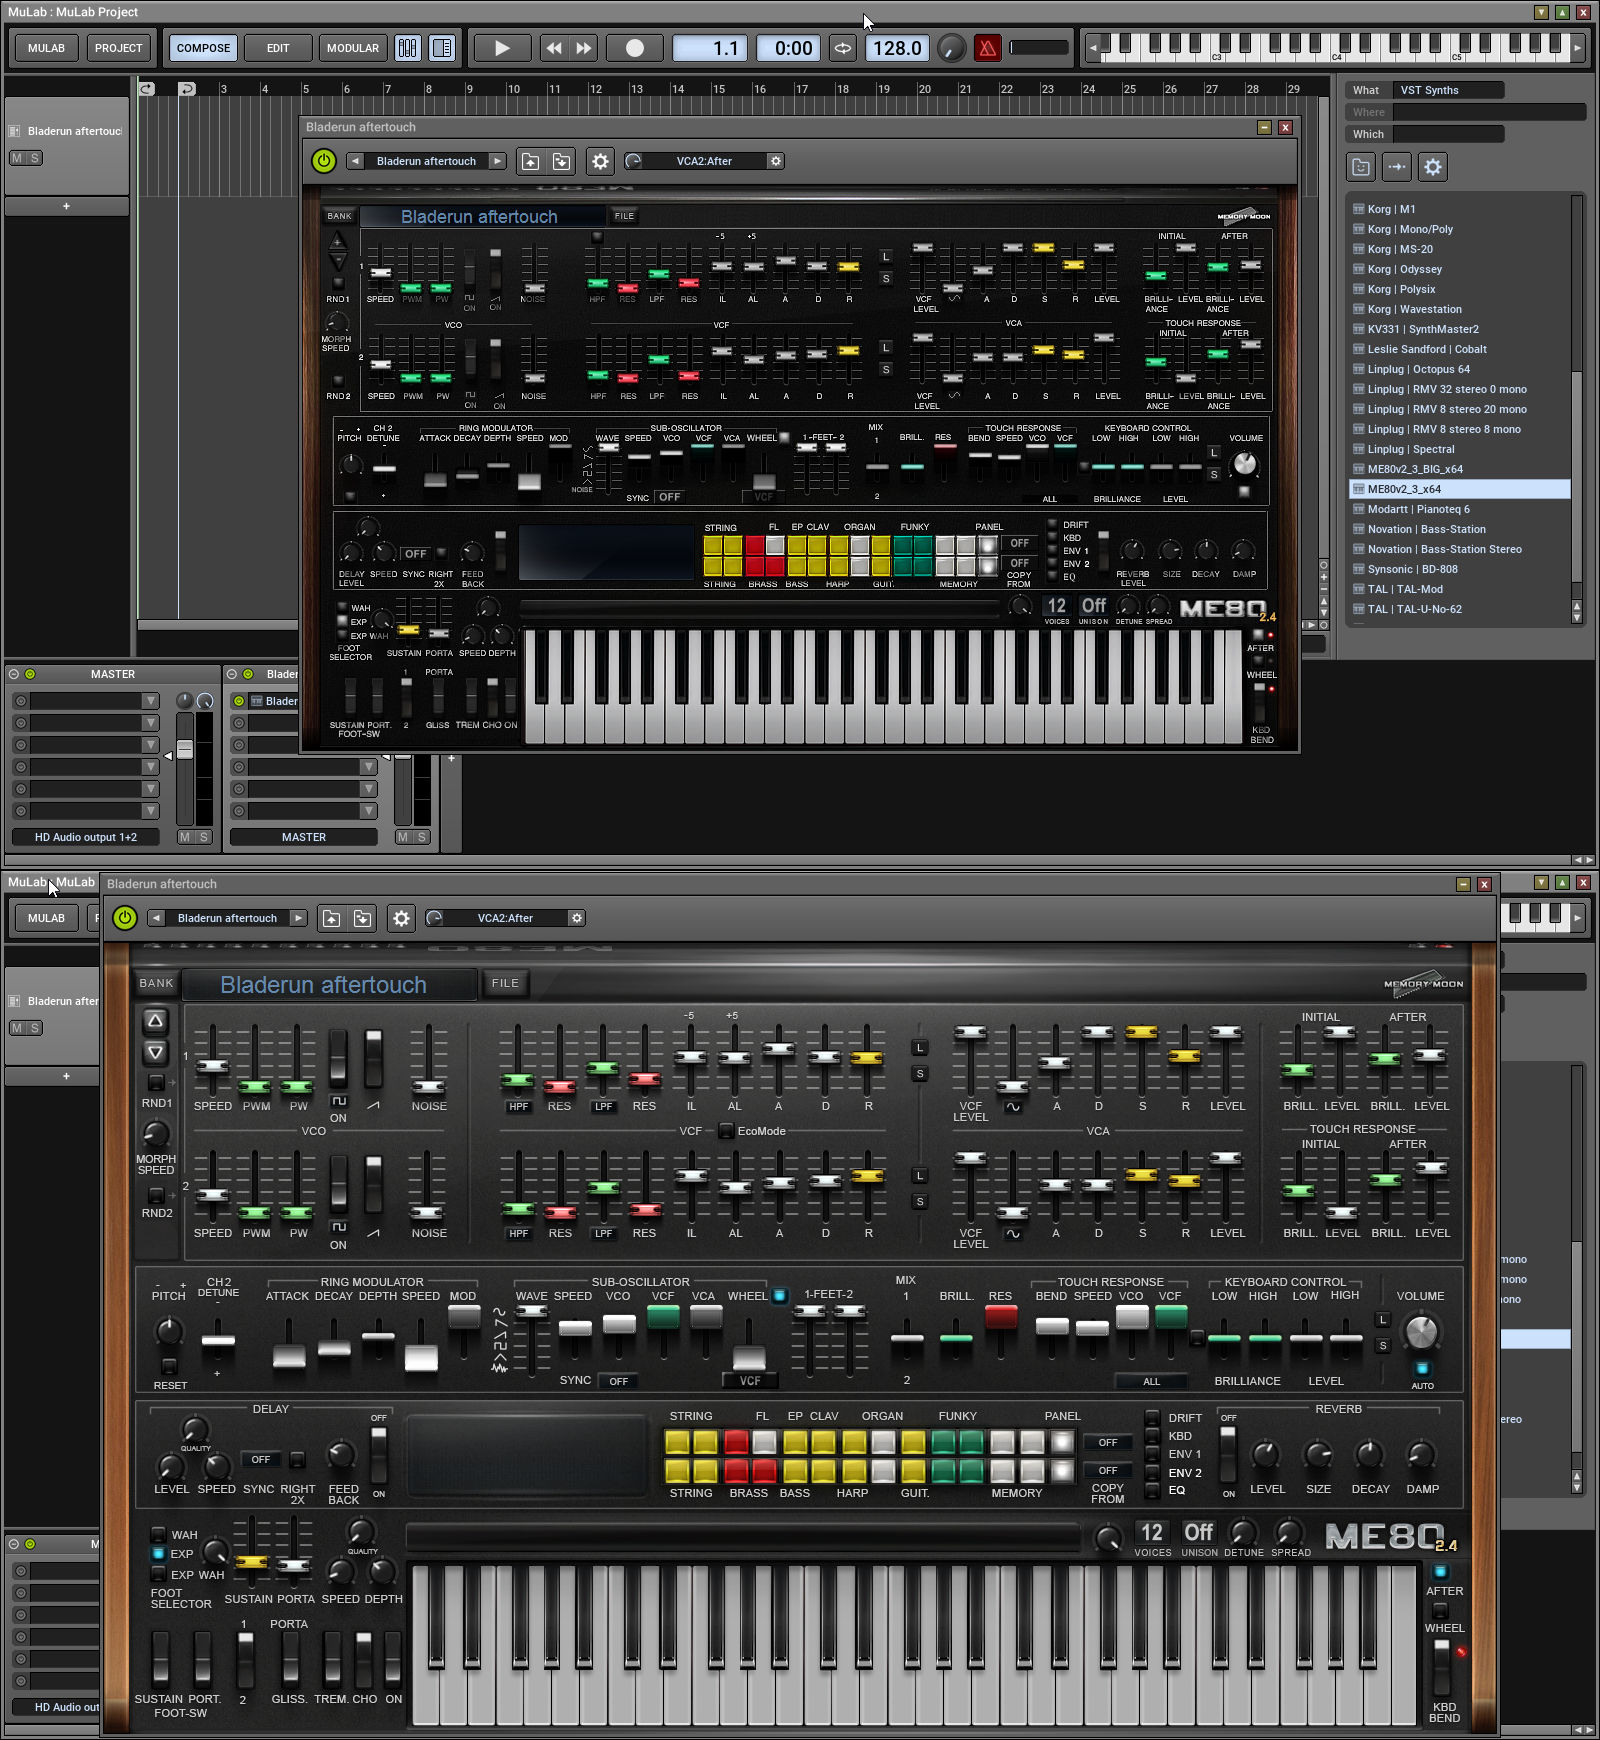 Yamaha CS-80 vst - Page 3 - KVR Audio